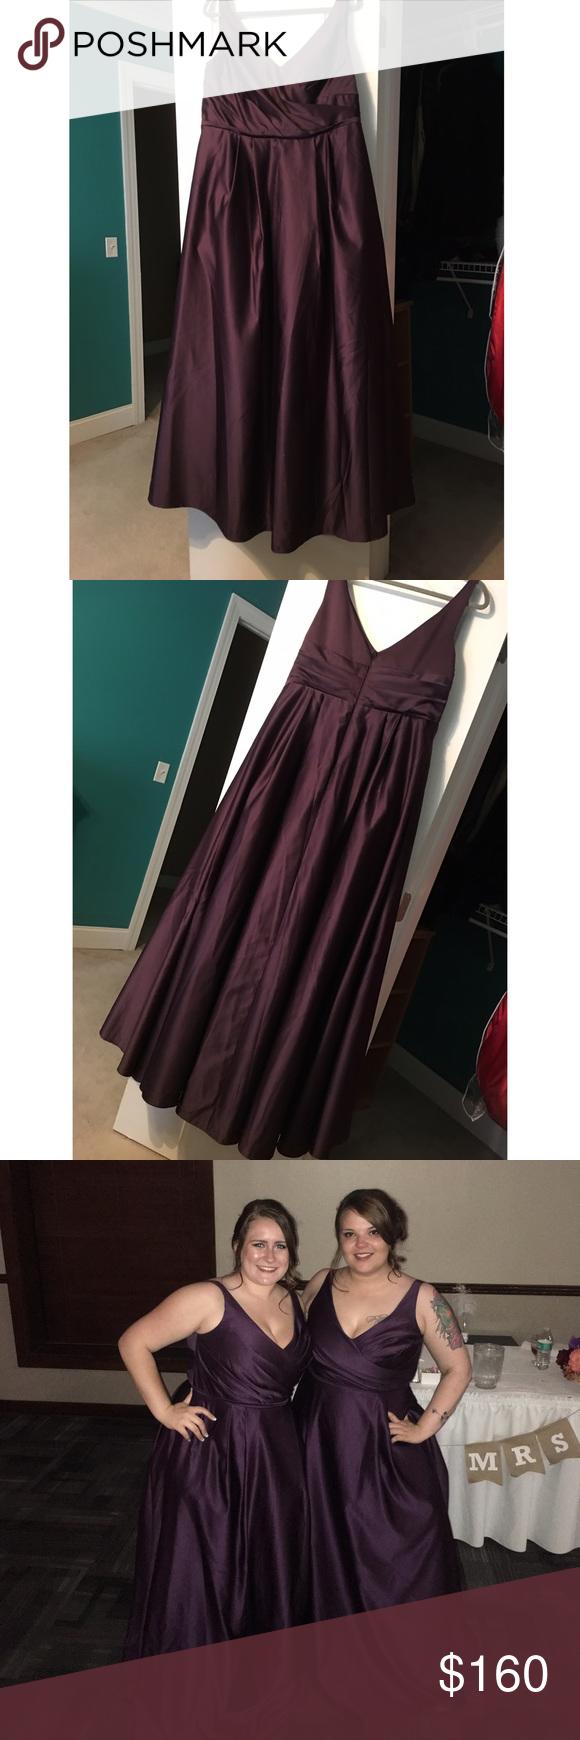 Purple formal dress not jovani bought as davids bridal for a